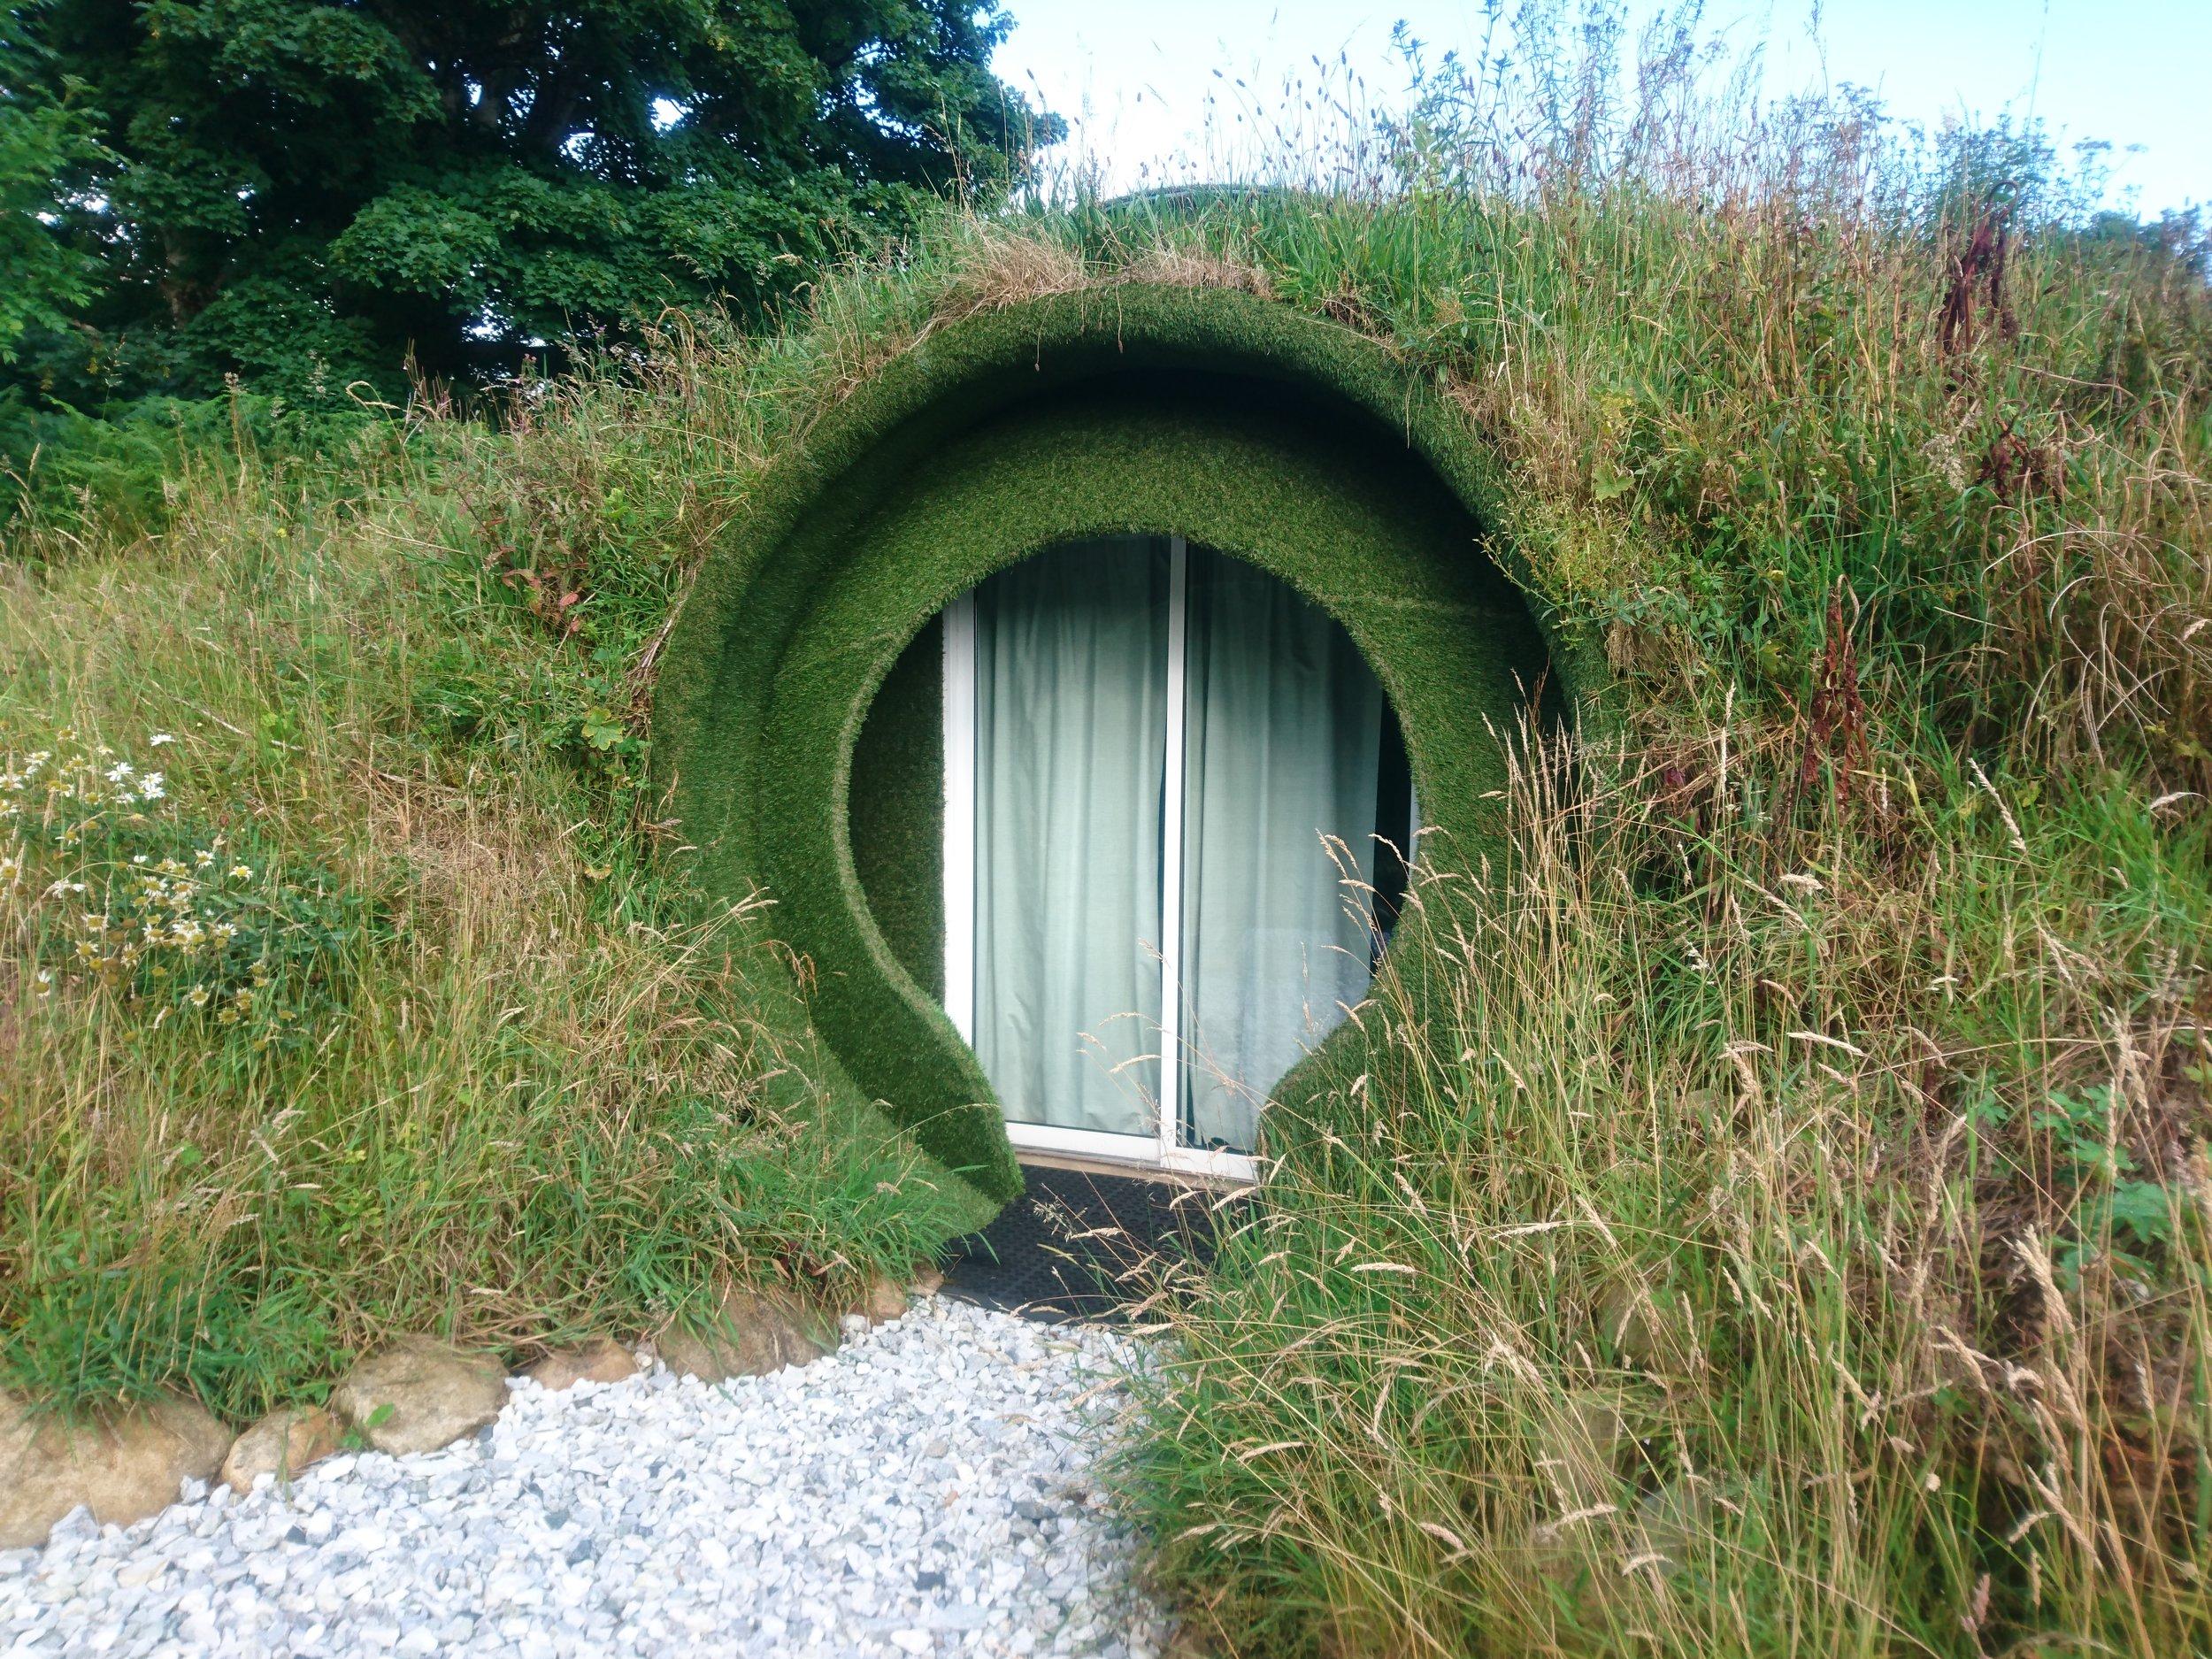 Hobbit House I